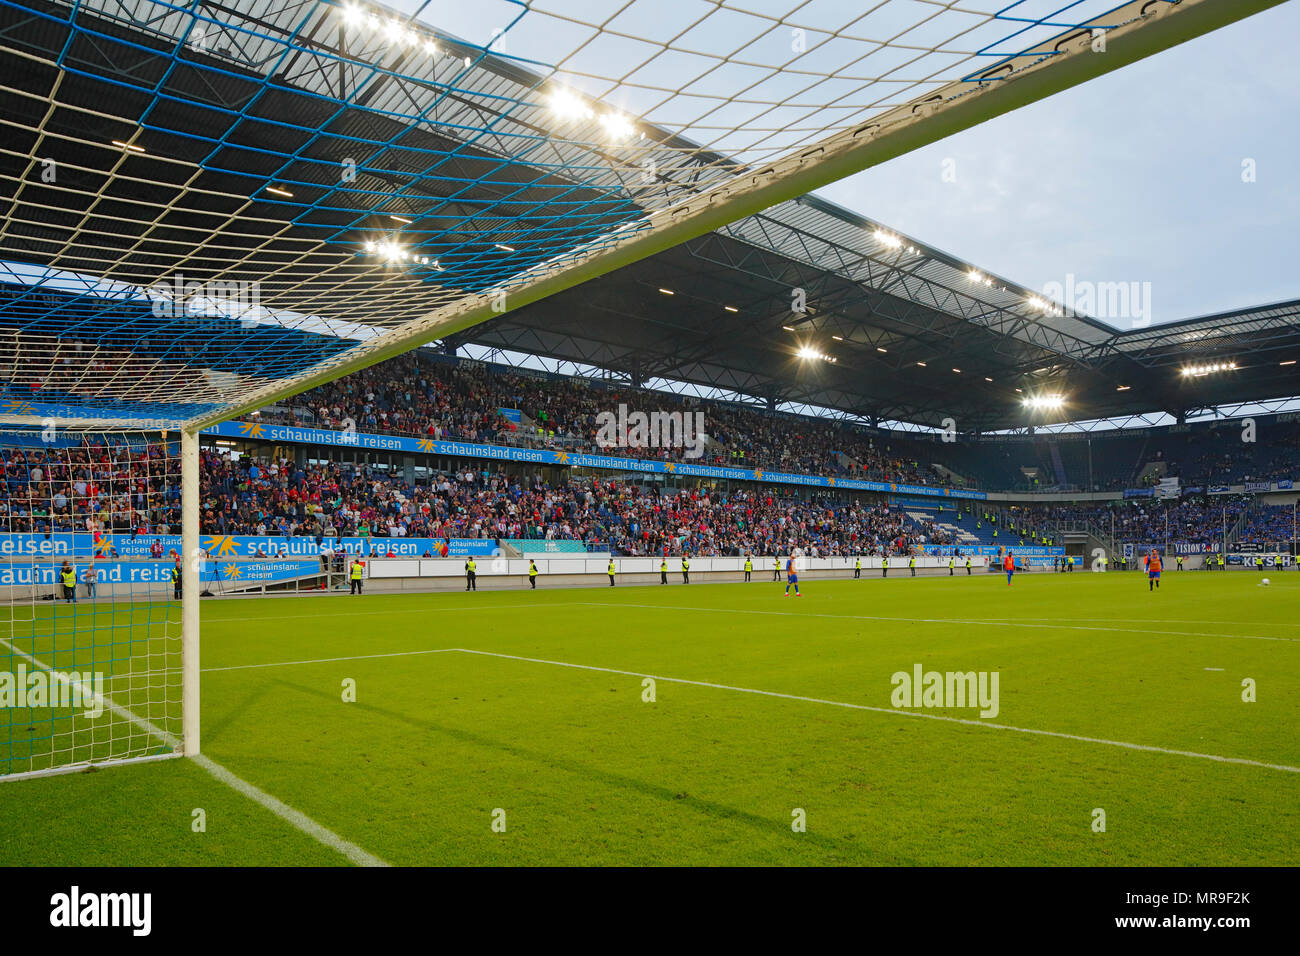 sports, football, Regional League West, Regional League Southwest, 2017/2018, relegation match to the 3. Bundesliga 2018/2019, first leg, Schauinsland Reisen Arena in Duisburg, KFC Uerdingen 05 vs SV Waldhof Mannheim 1:0, stadium view, stands, pitch, football goal, floodlight - Stock Image